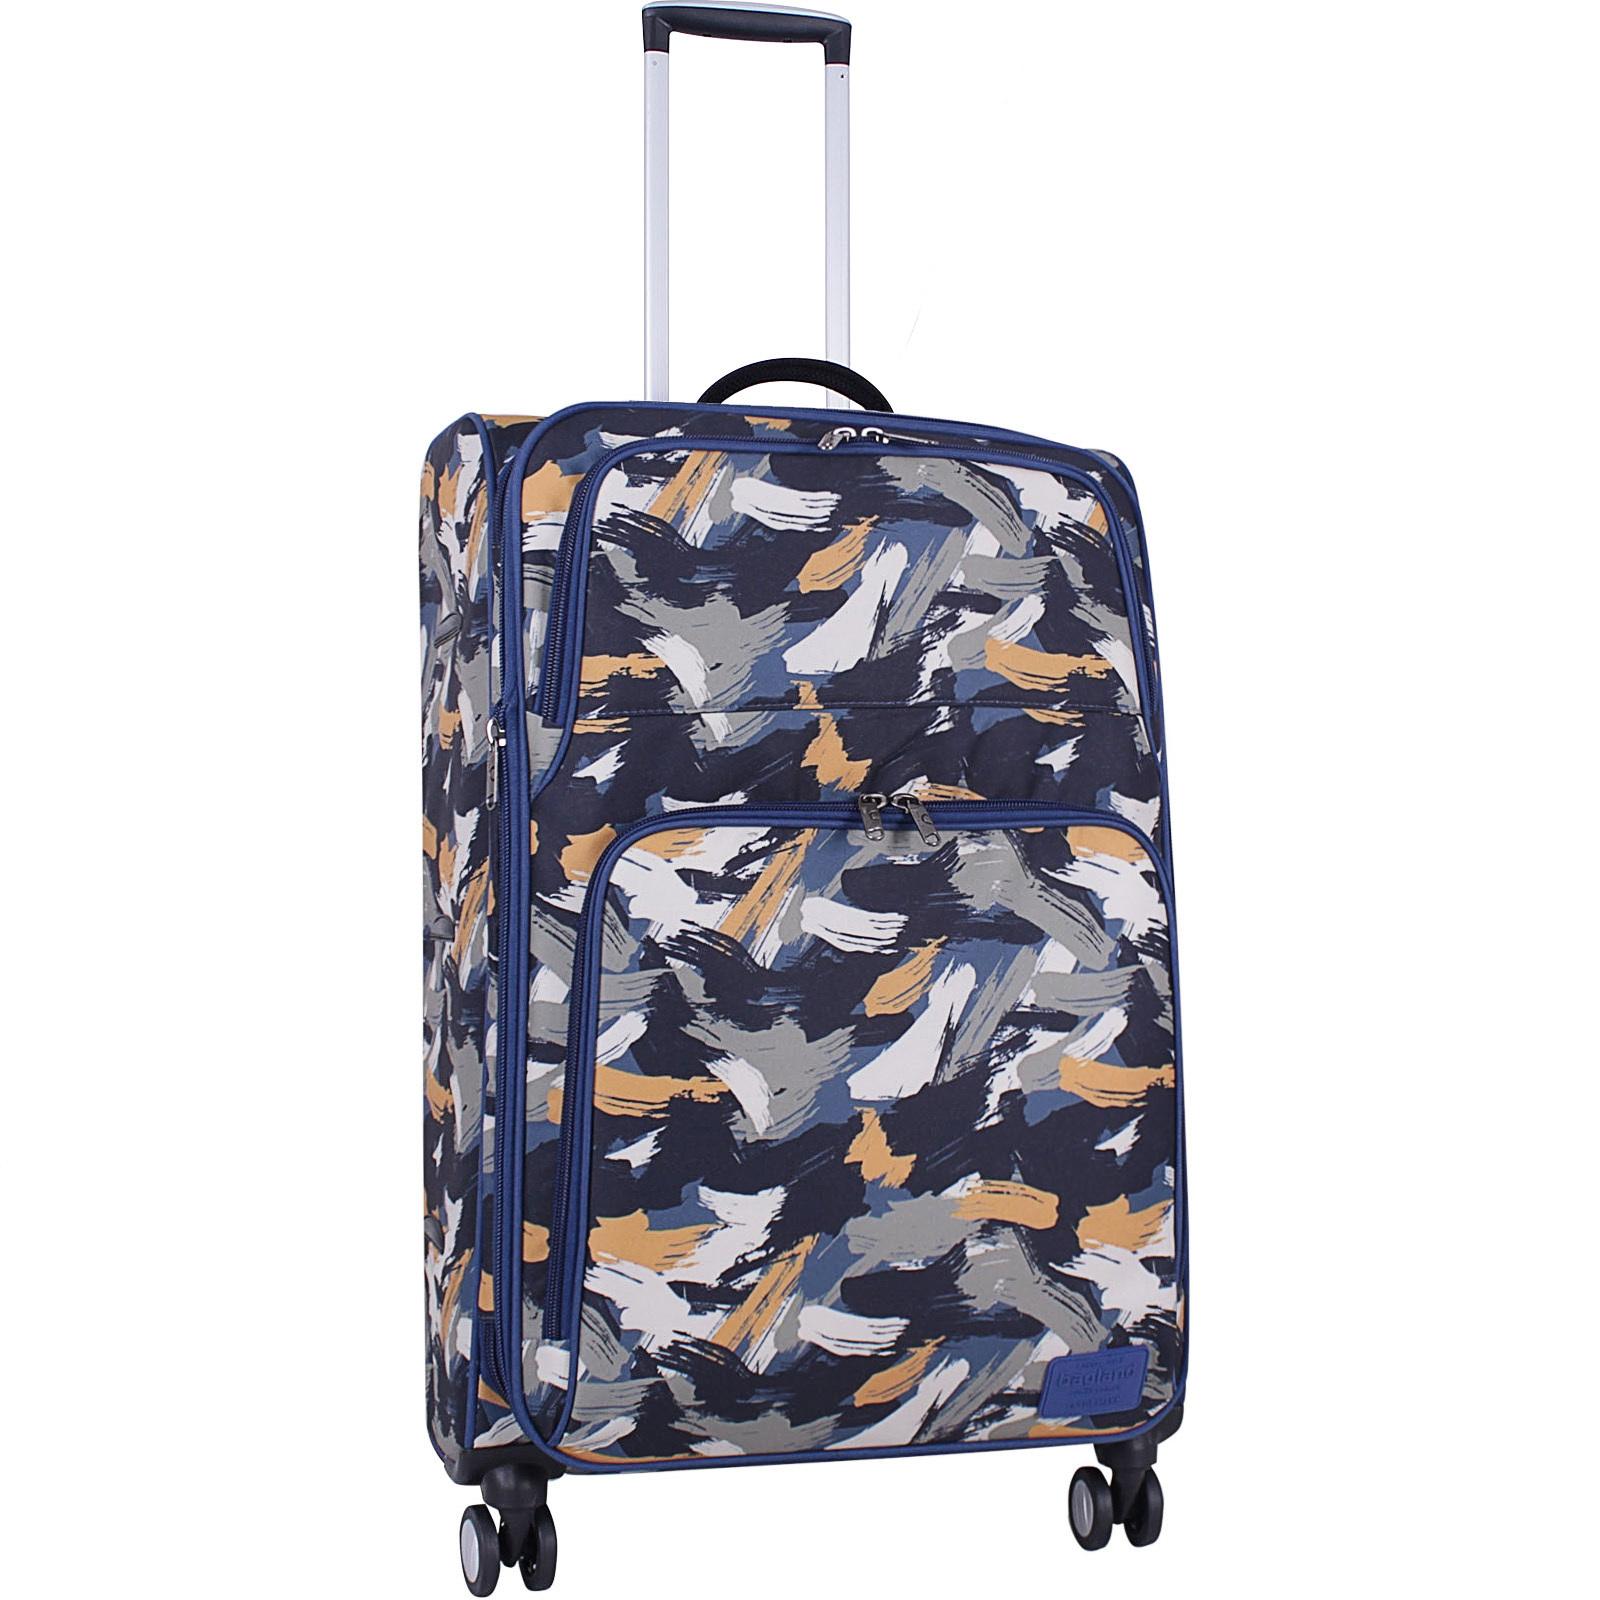 Дорожные чемоданы Чемодан Bagland Валенсия большой дизайн 83л. сублімація 773 (0037966274) IMG_8825_суб773_-1600.jpg